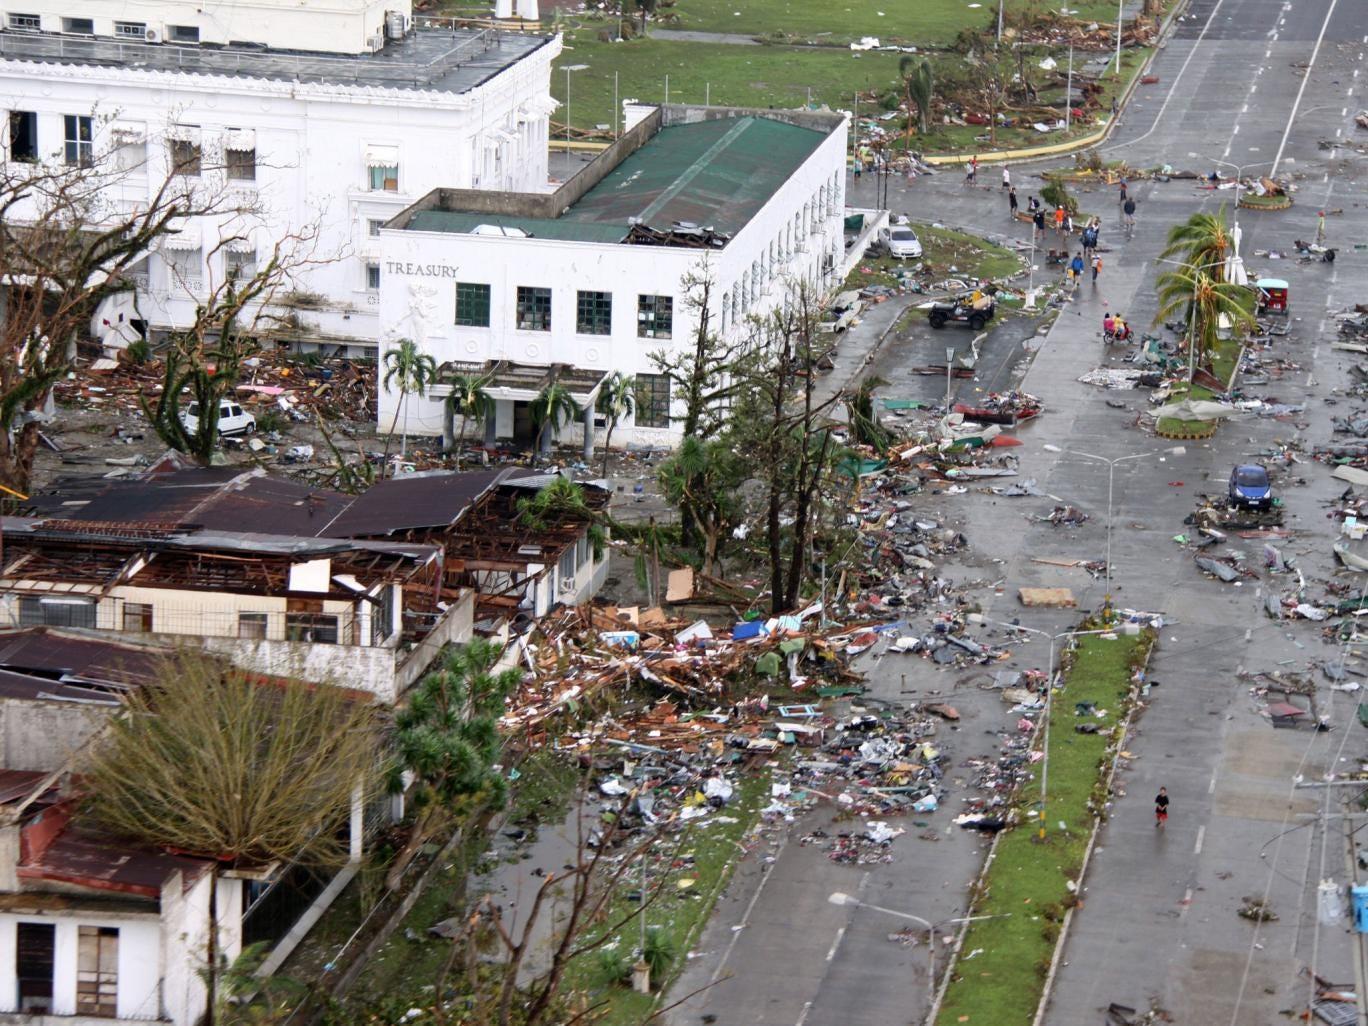 The aftermath of Typhoon Haiyan in Tacloban